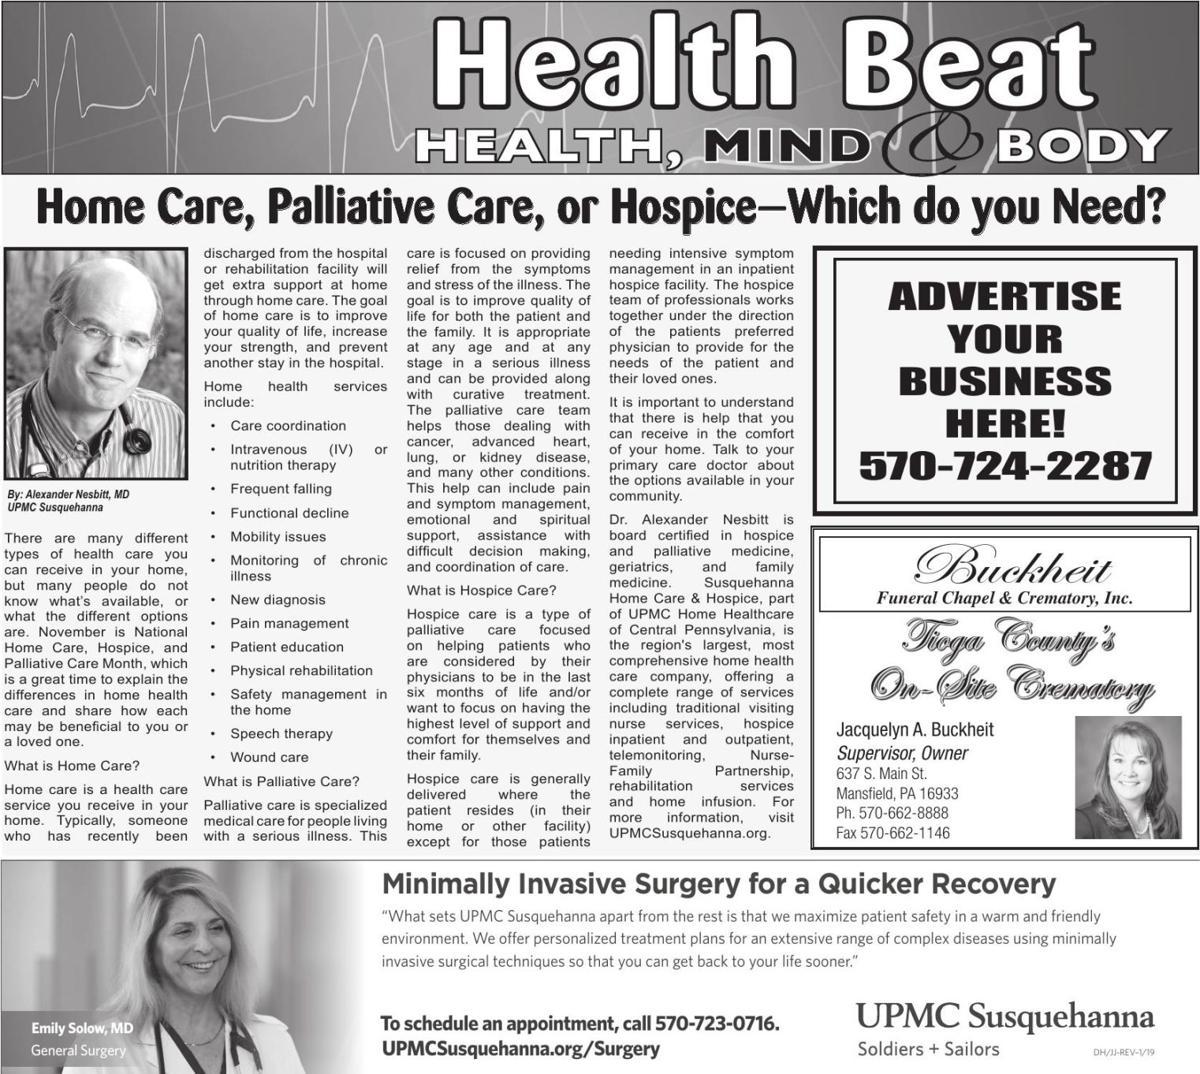 Health Page 11-7-19.pdf